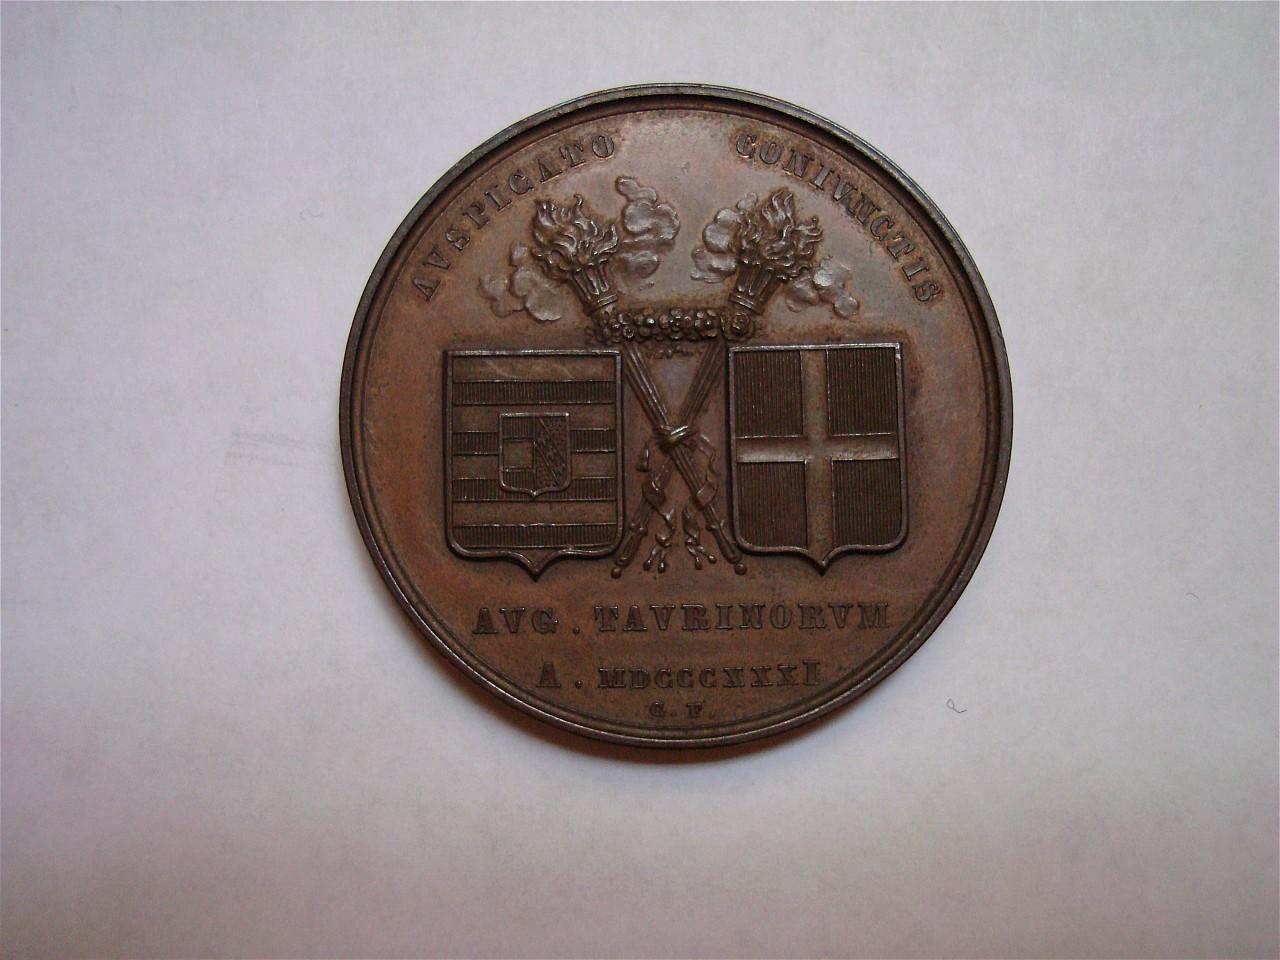 ritratti di Ferdinando e Marianna Pia d'Ungheria (medaglia) di Ferraris Giuseppe (sec. XIX)